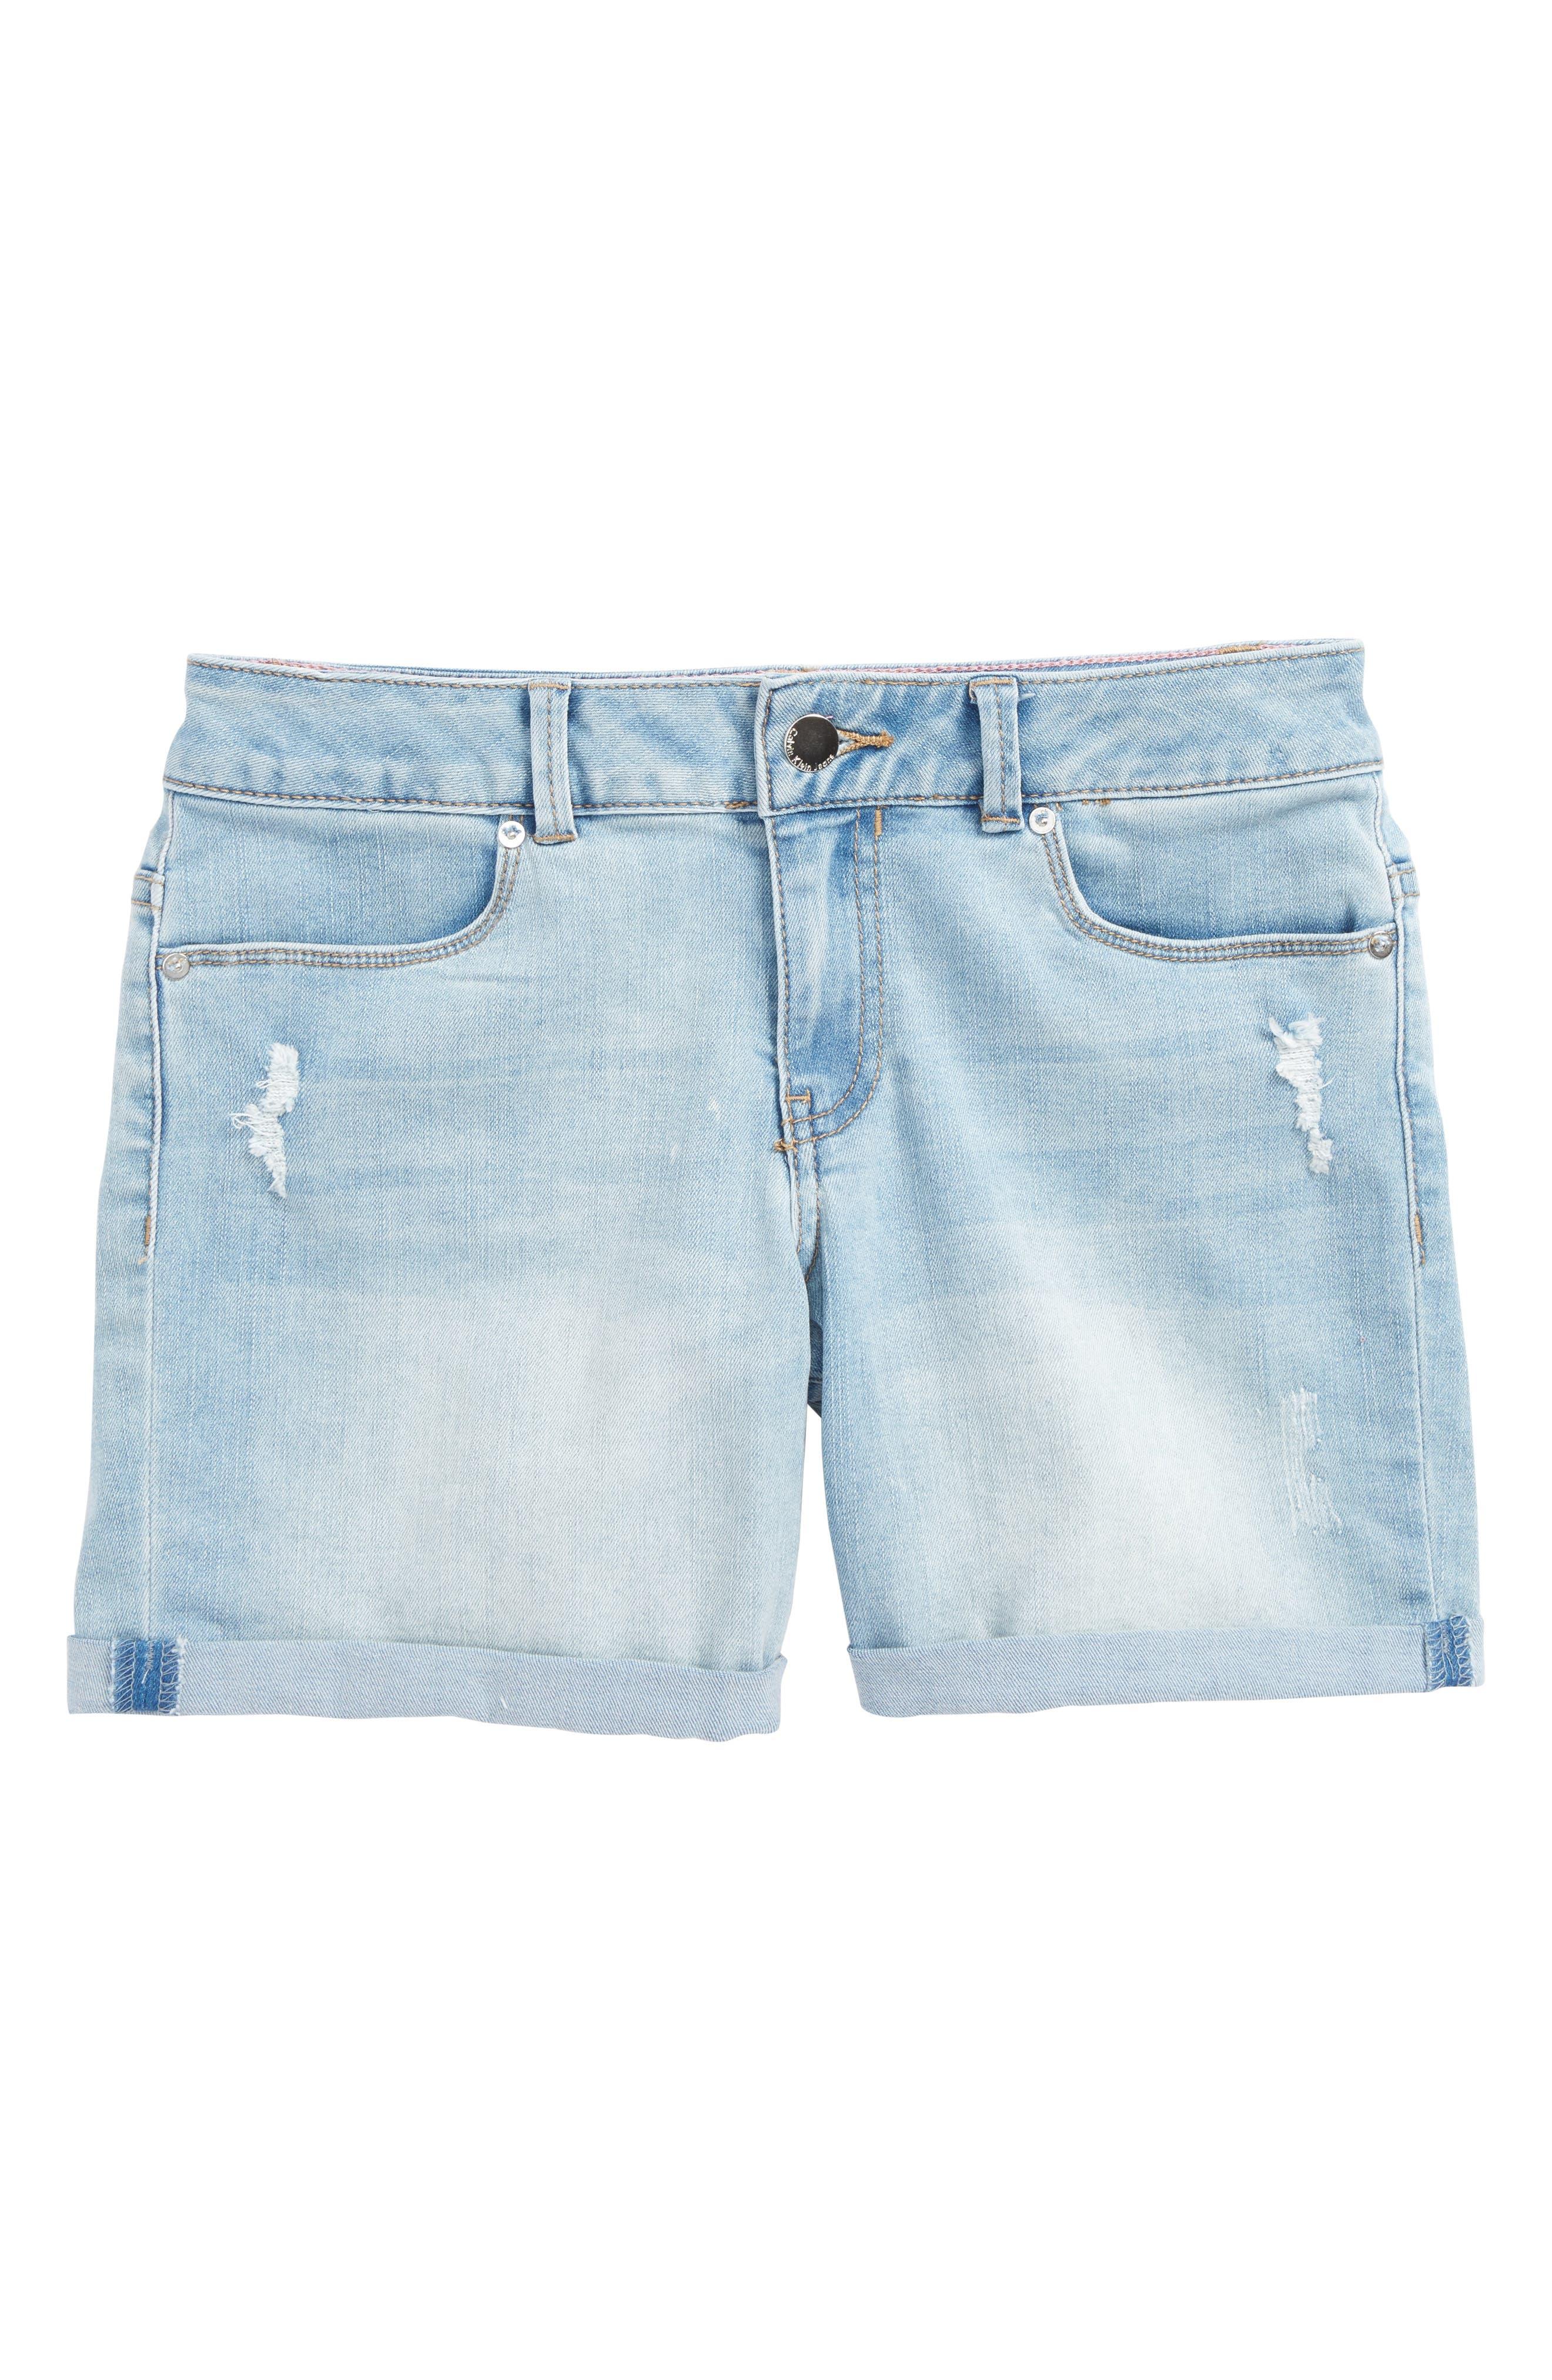 Alternate Image 1 Selected - Calvin Klein Bermuda Shorts (Big Girls)